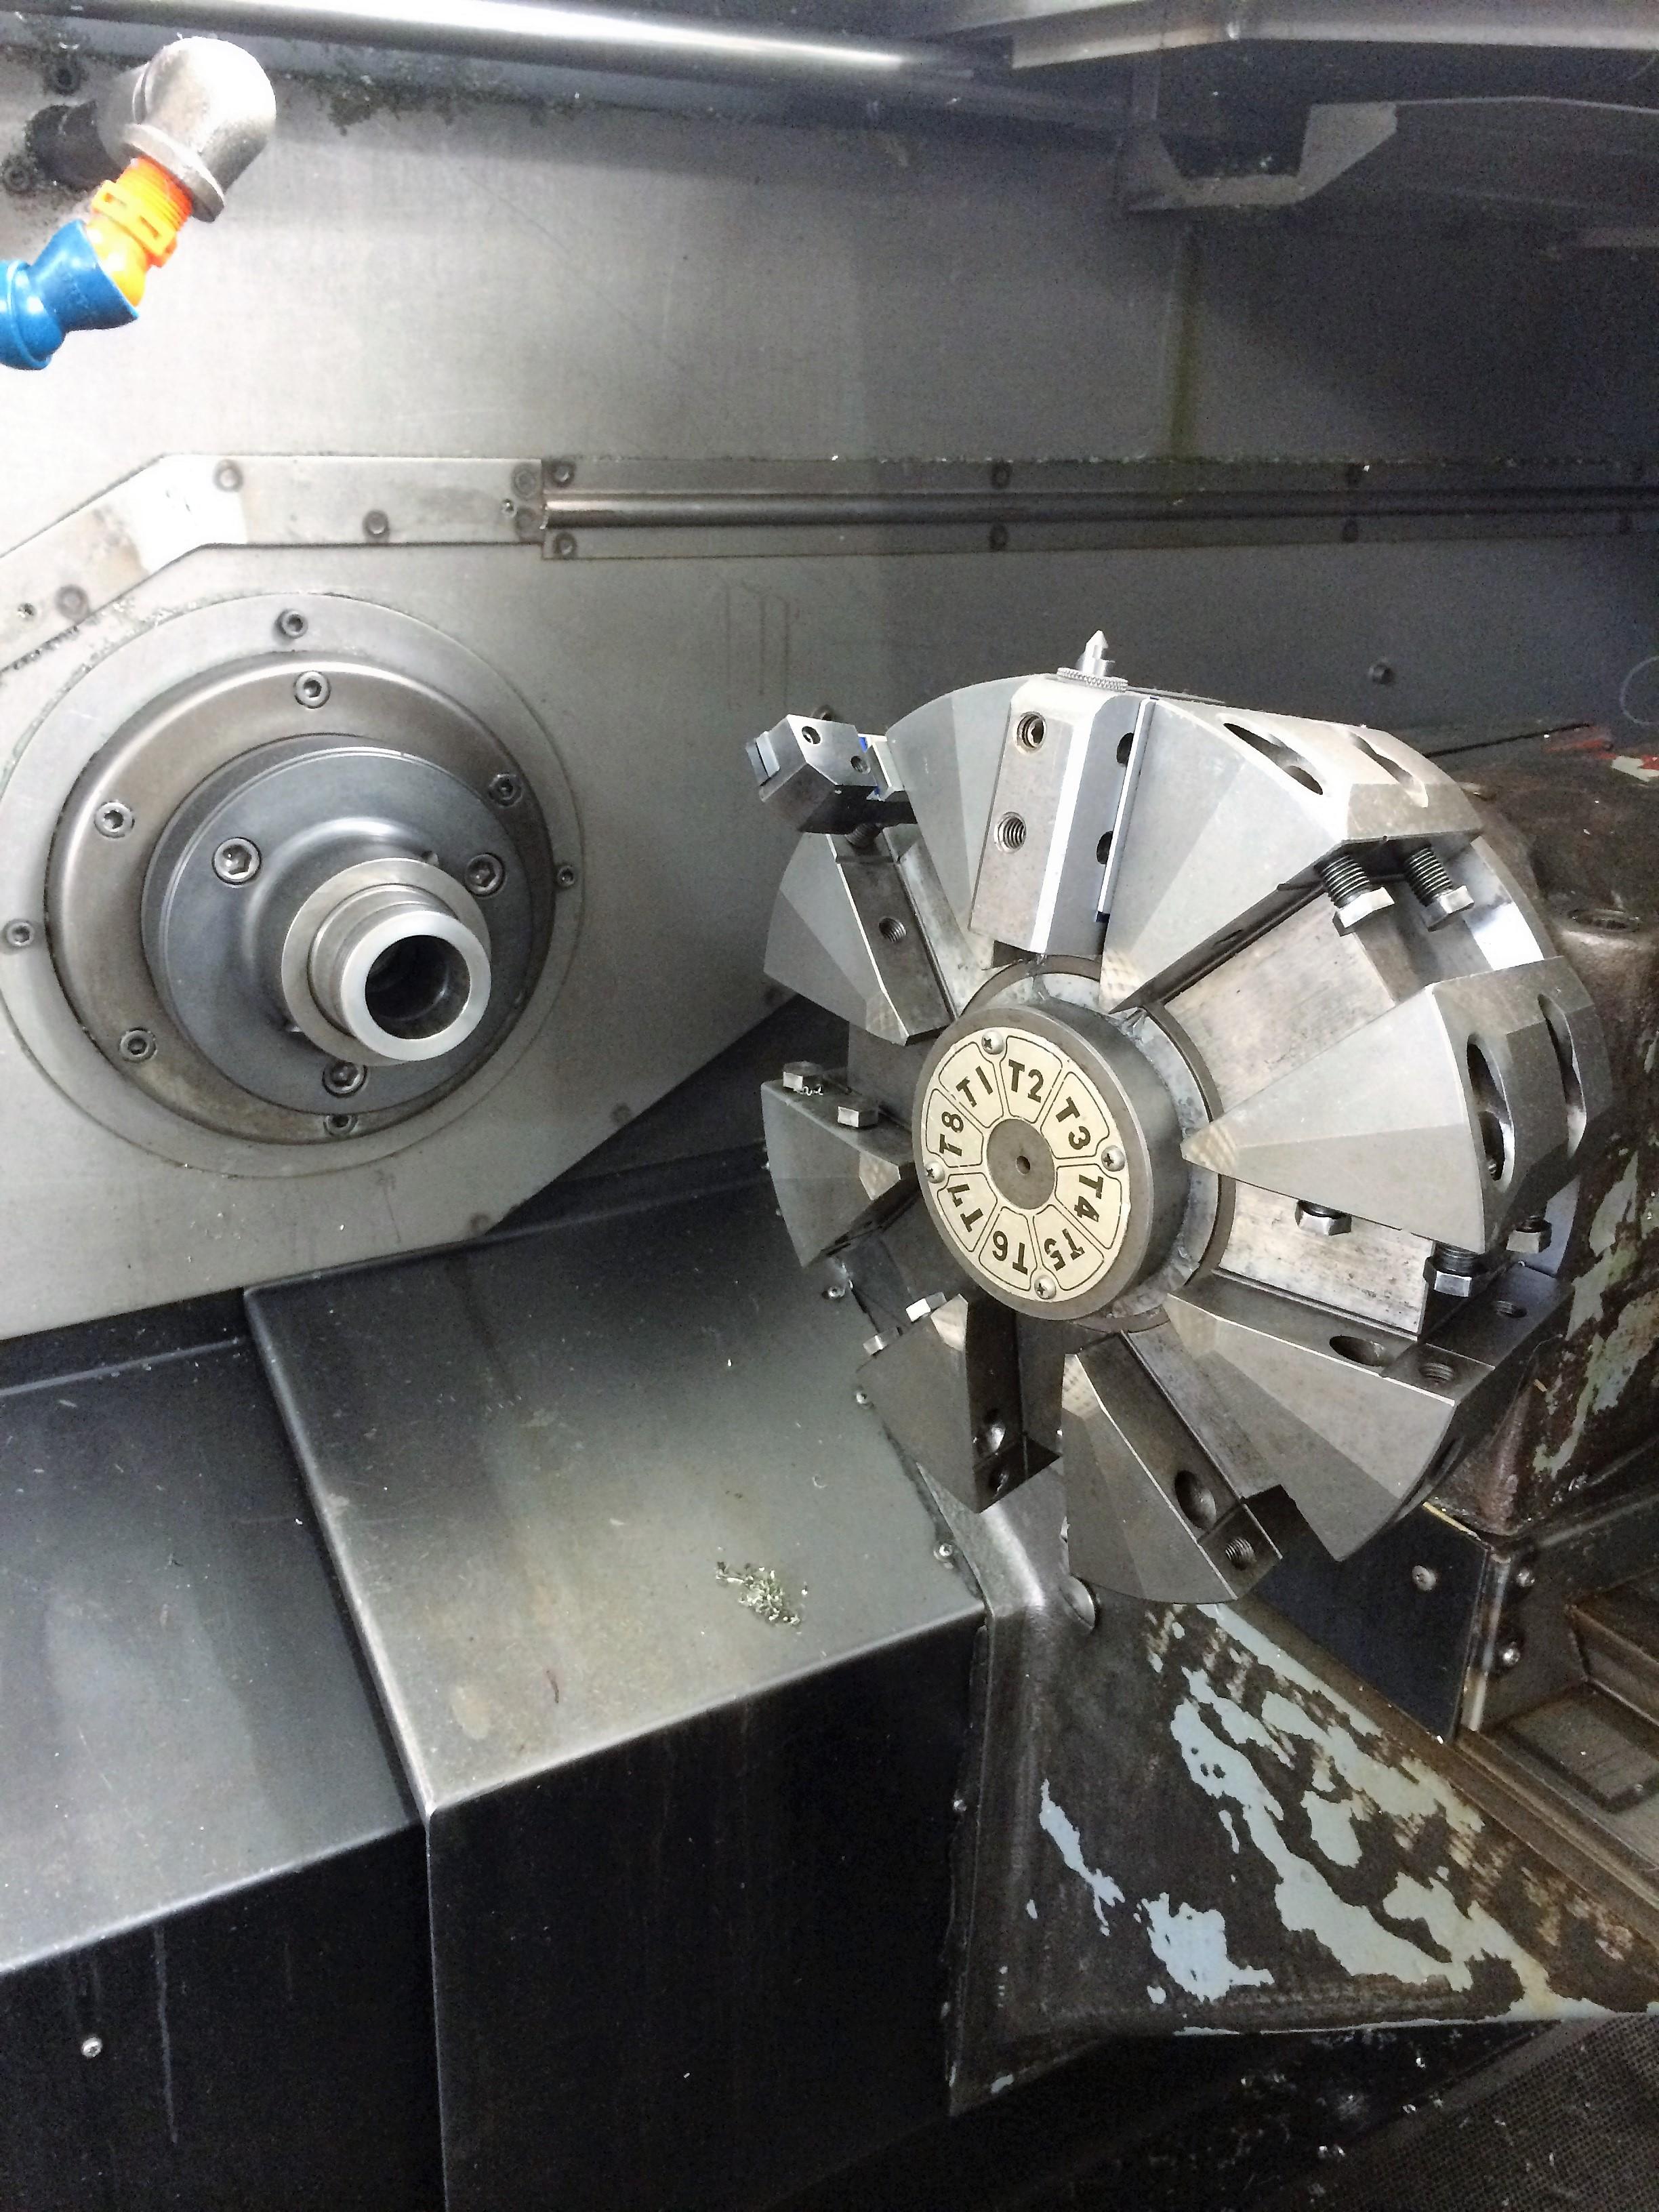 Okuma LC10 CNC Lathe with: 5C Collet Nose, Transformer, and Internal Coolant System.